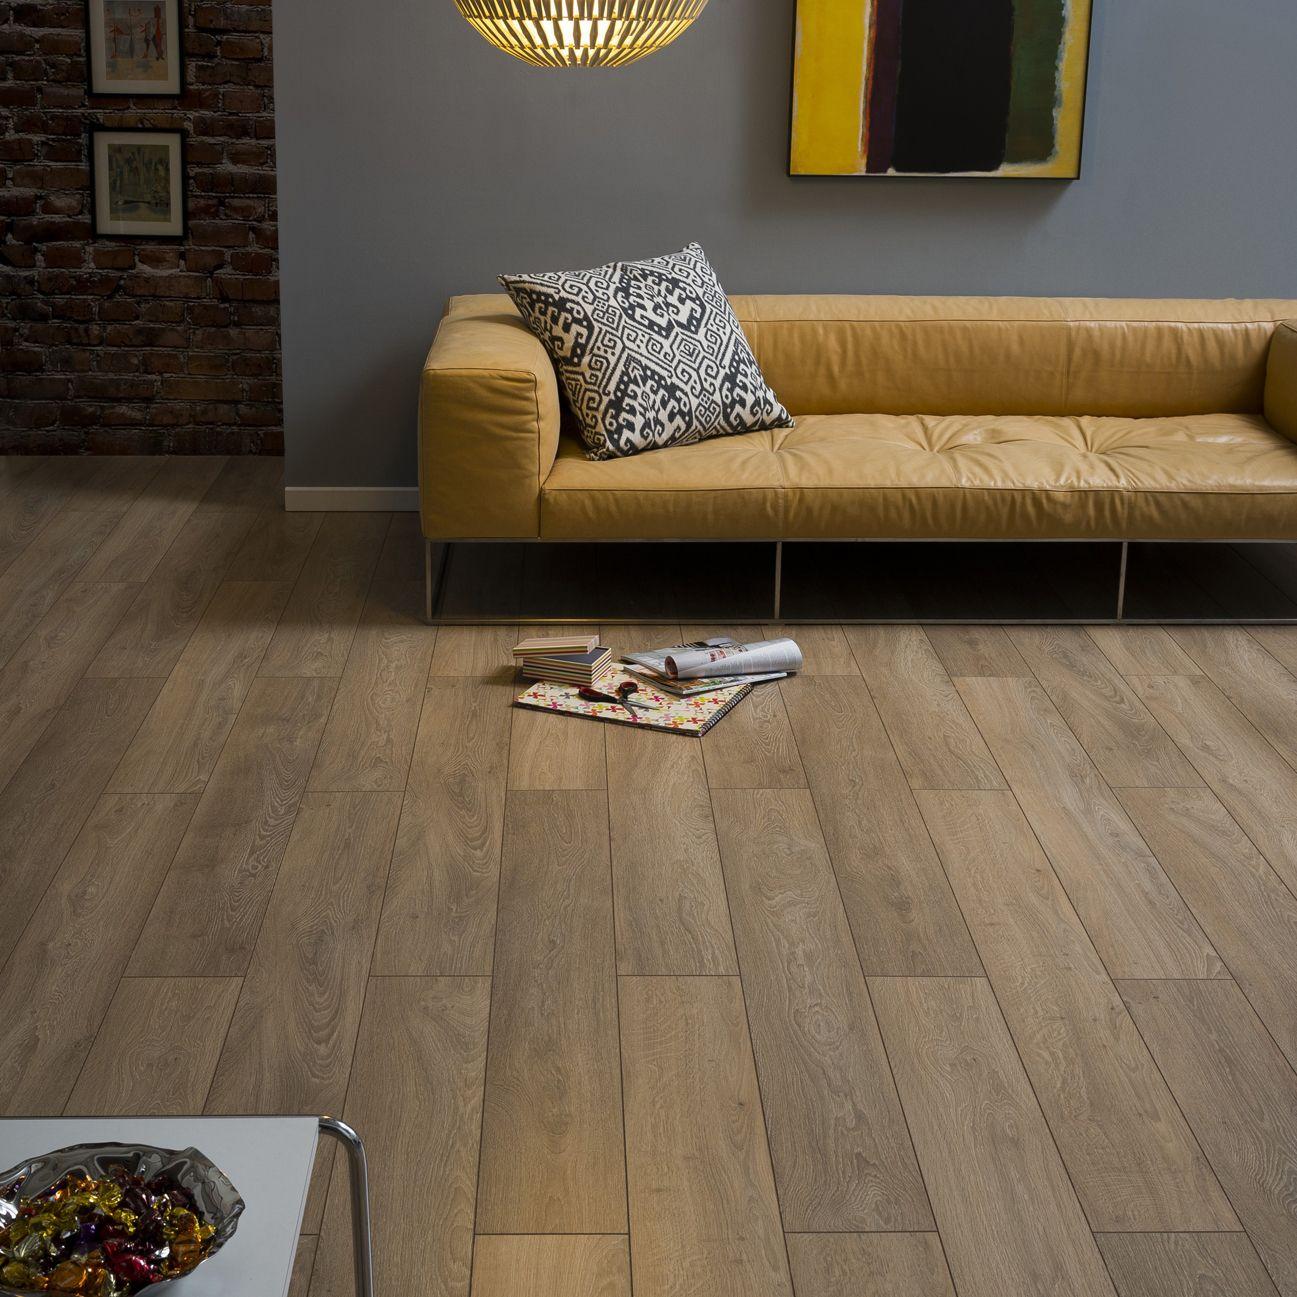 Amadeo Burlington Oak Effect Wood Laminate 2 22 M² Pack Departments Diy At B Q